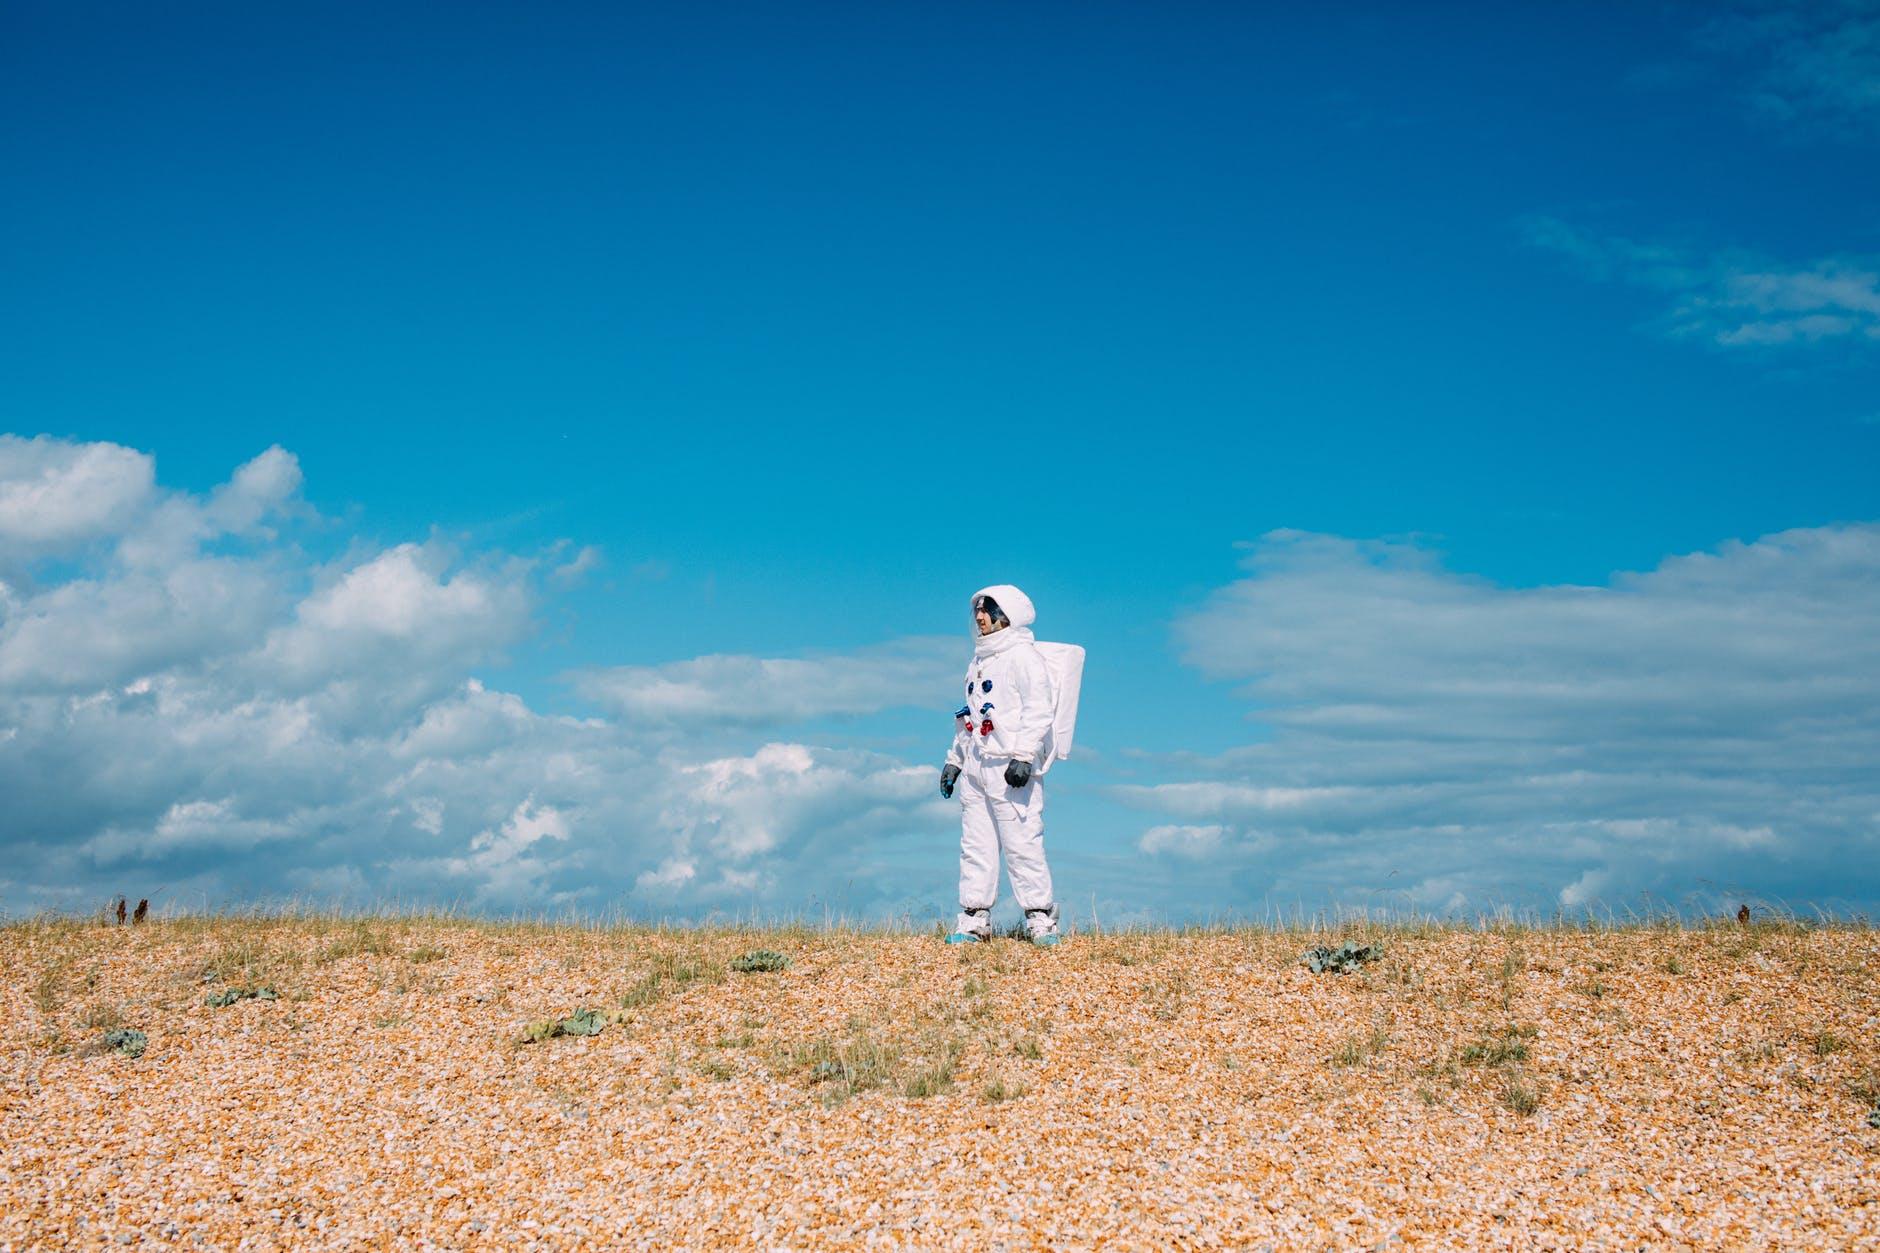 astronaut standing alone